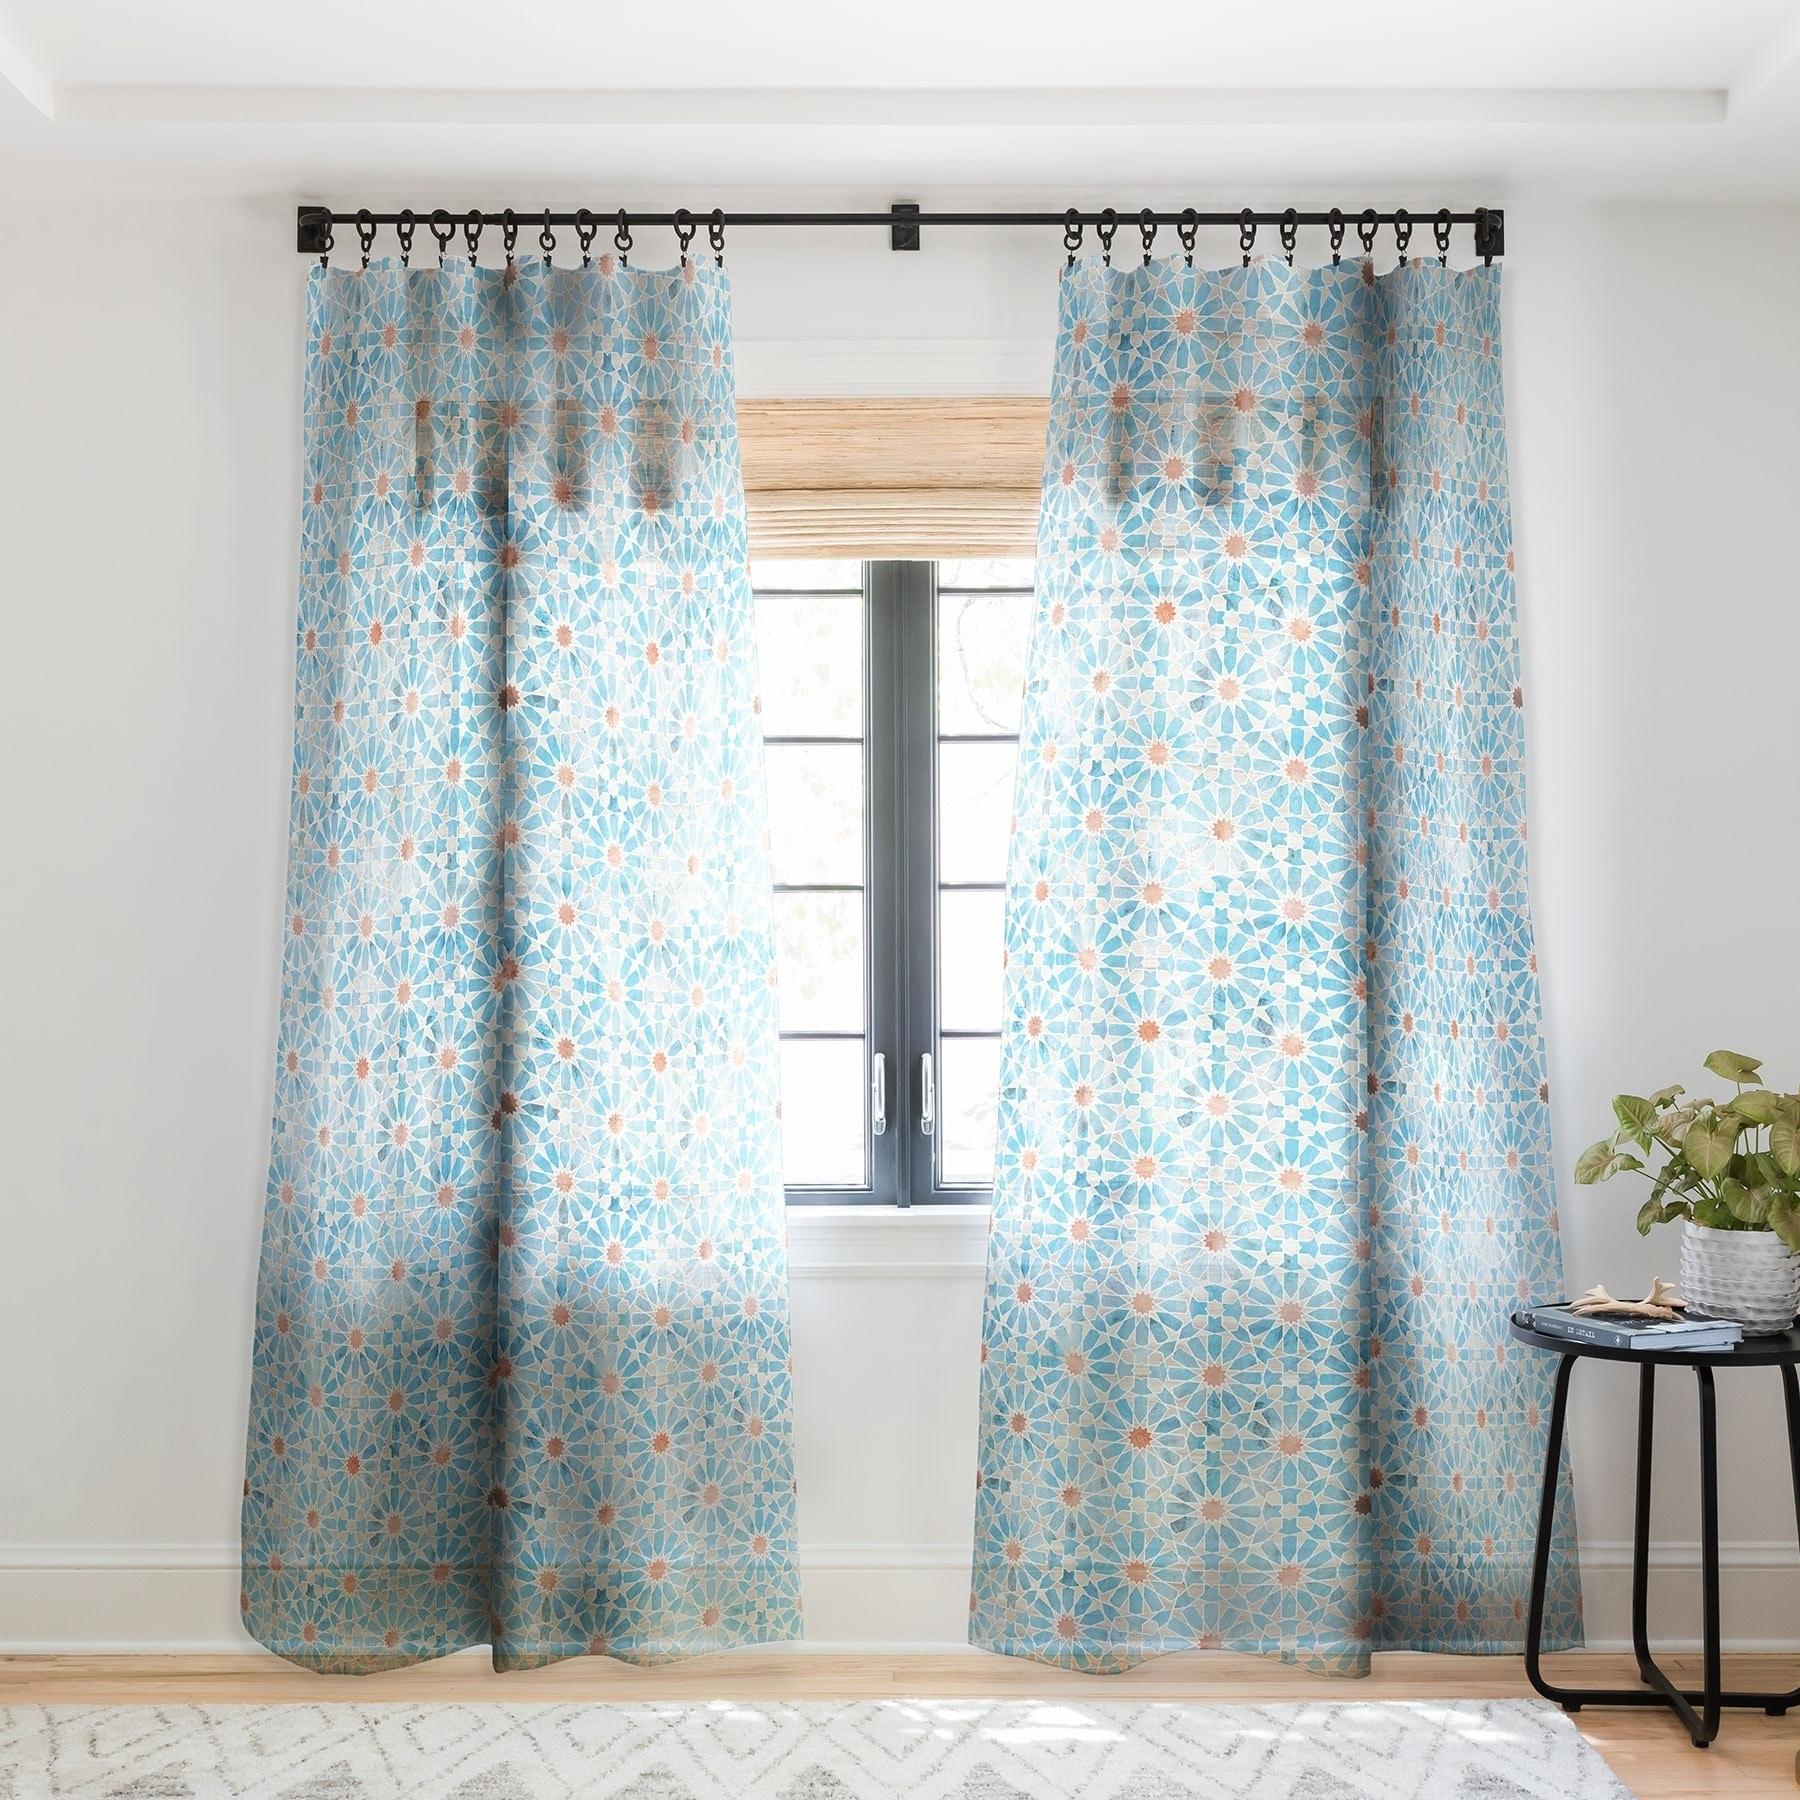 Schatzi Brown Hara Tiles Light Blue Single Panel Sheer Curtain 50 X 84 On Sale Overstock 22043077